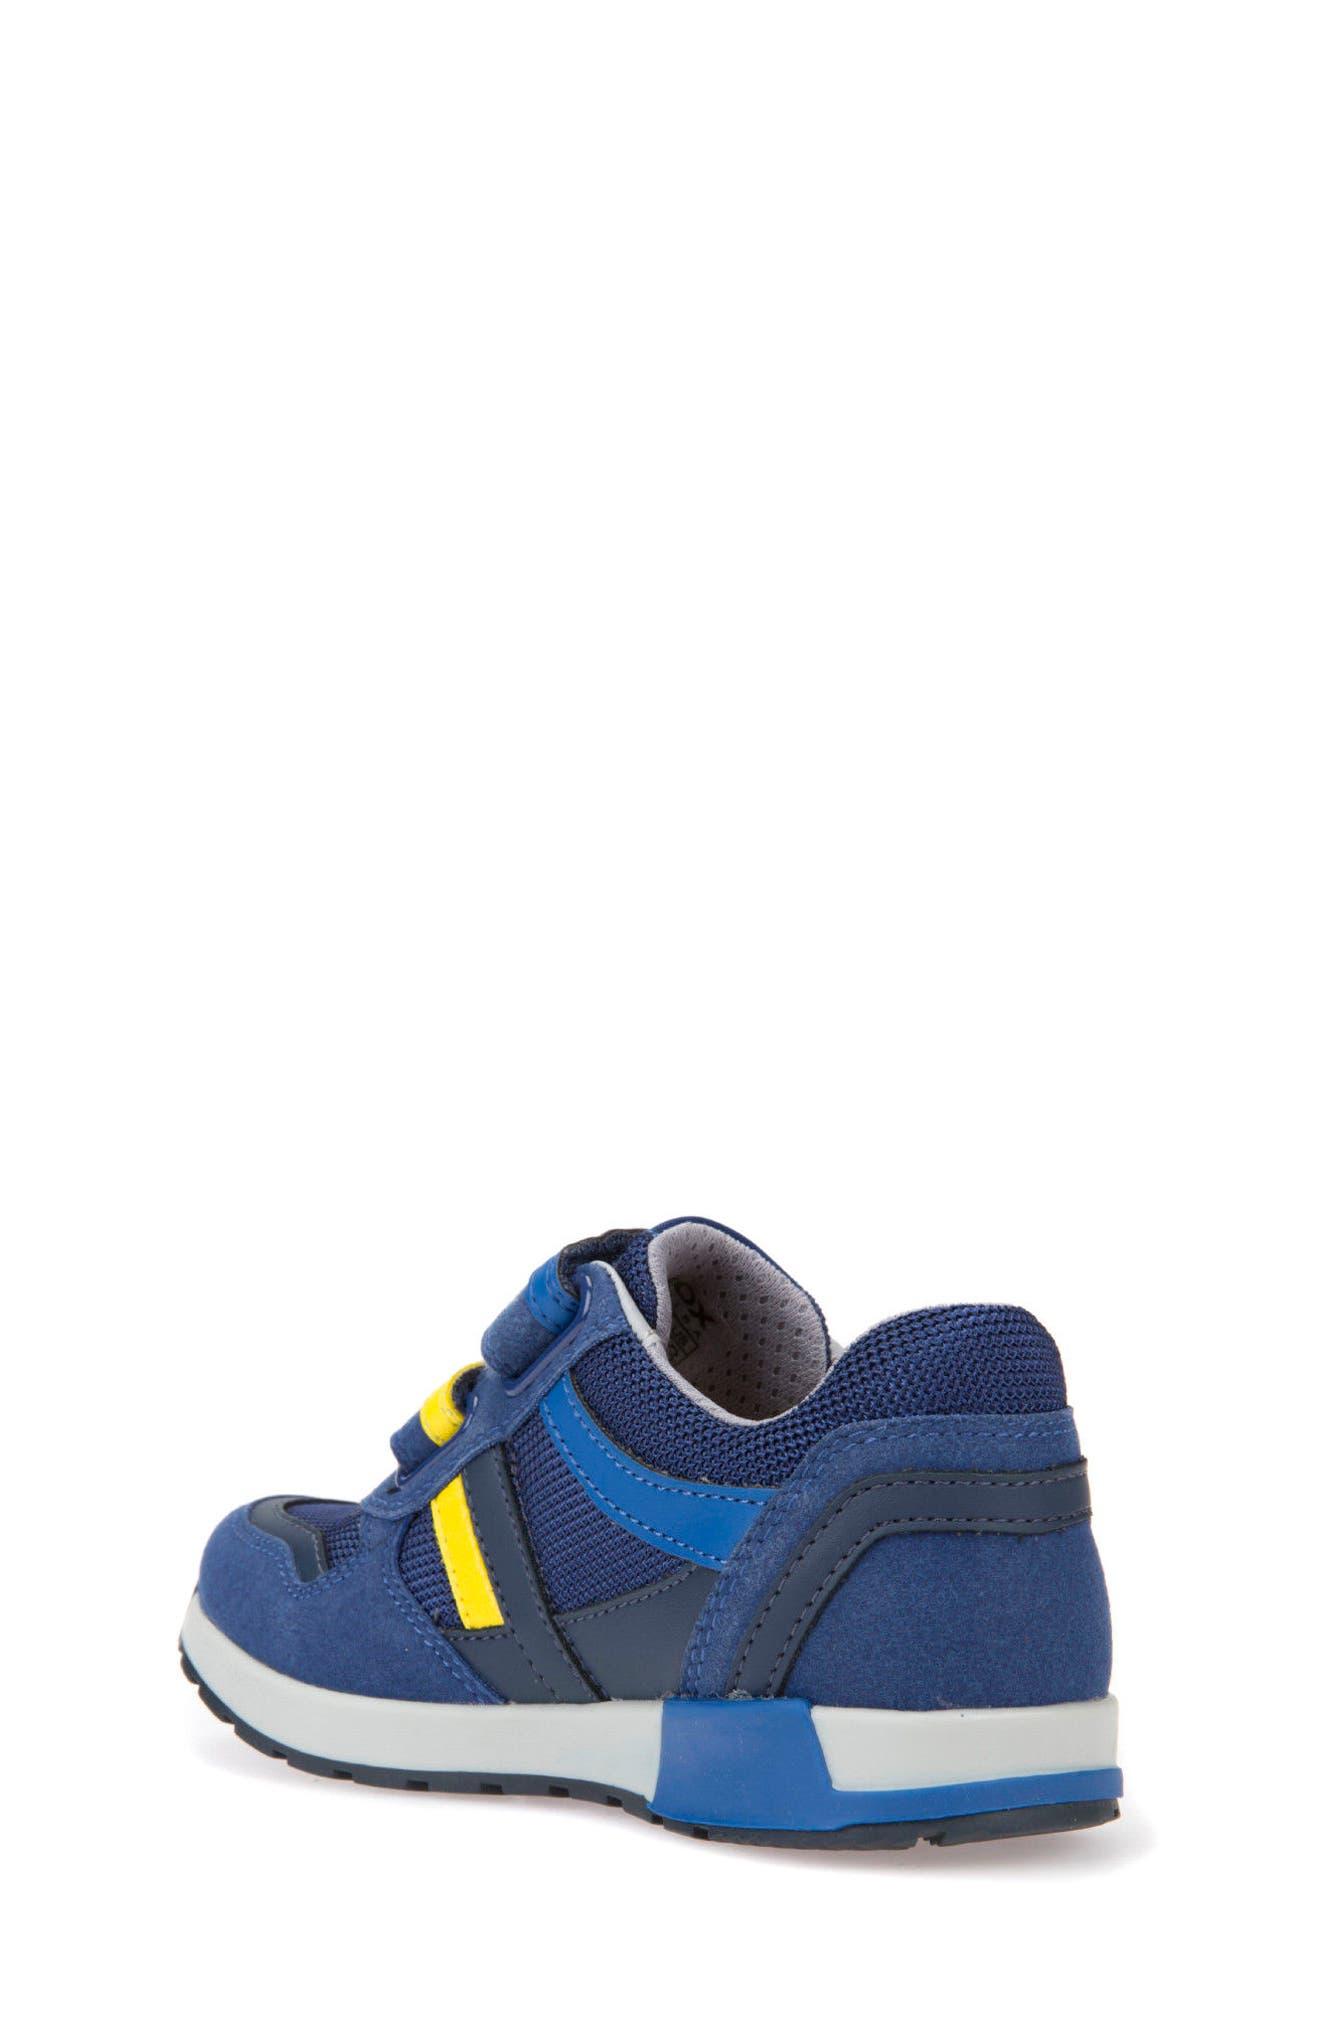 Alfier Stripe Low Top Sneaker,                             Alternate thumbnail 2, color,                             Blue/ Yellow